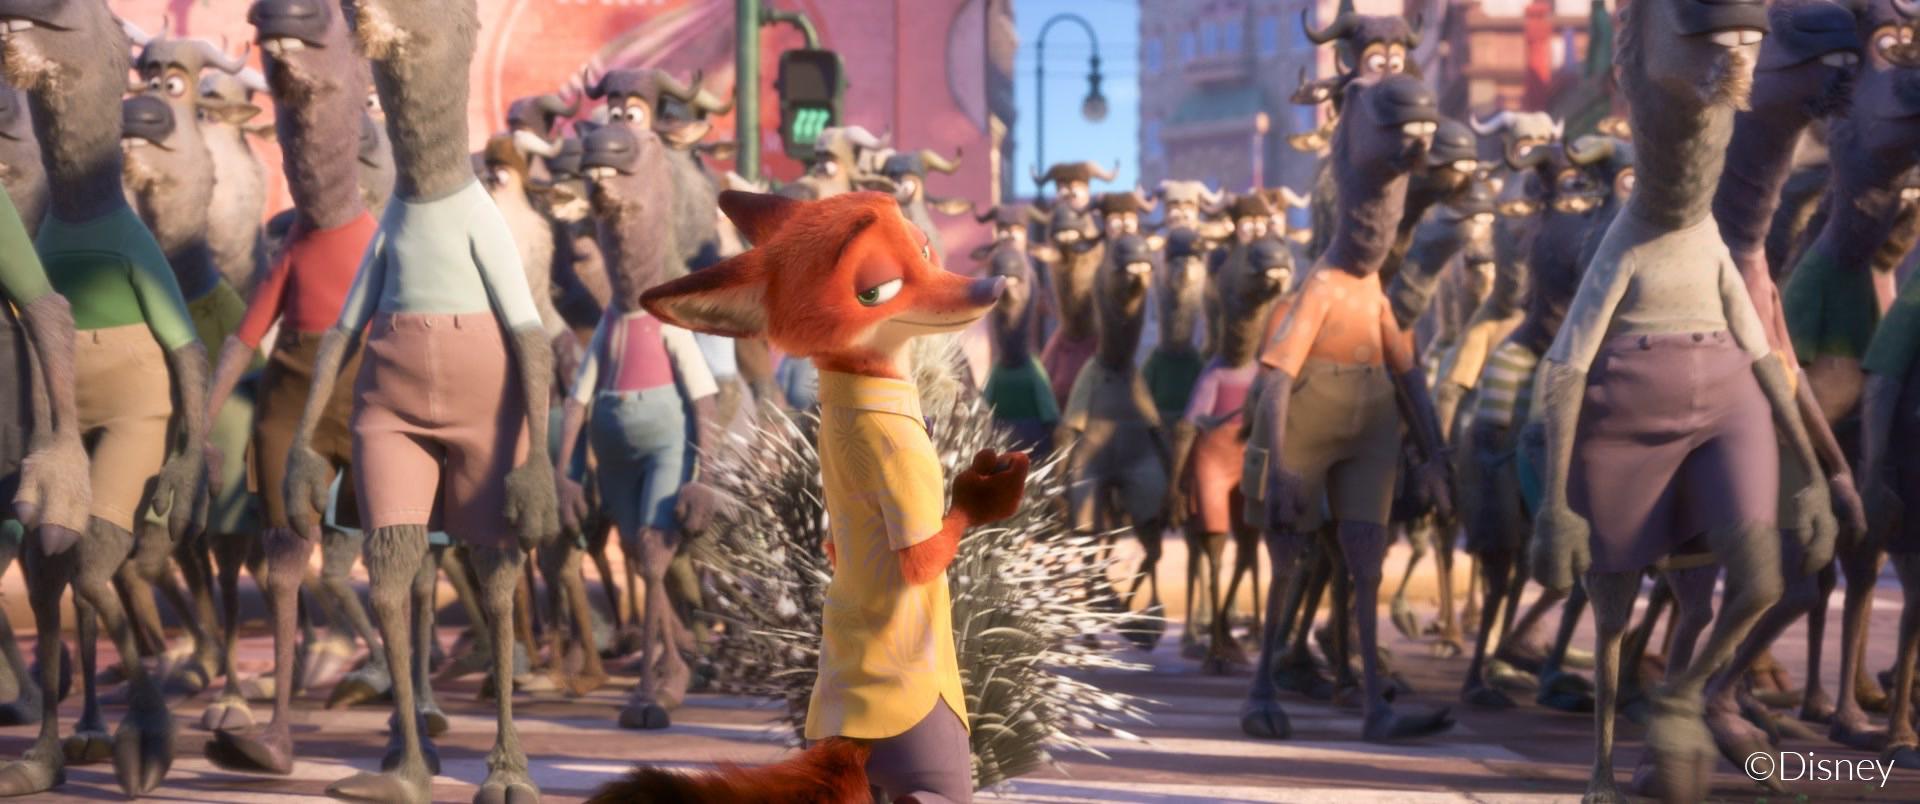 Disney Animation Studios   Zootopia   SideFX